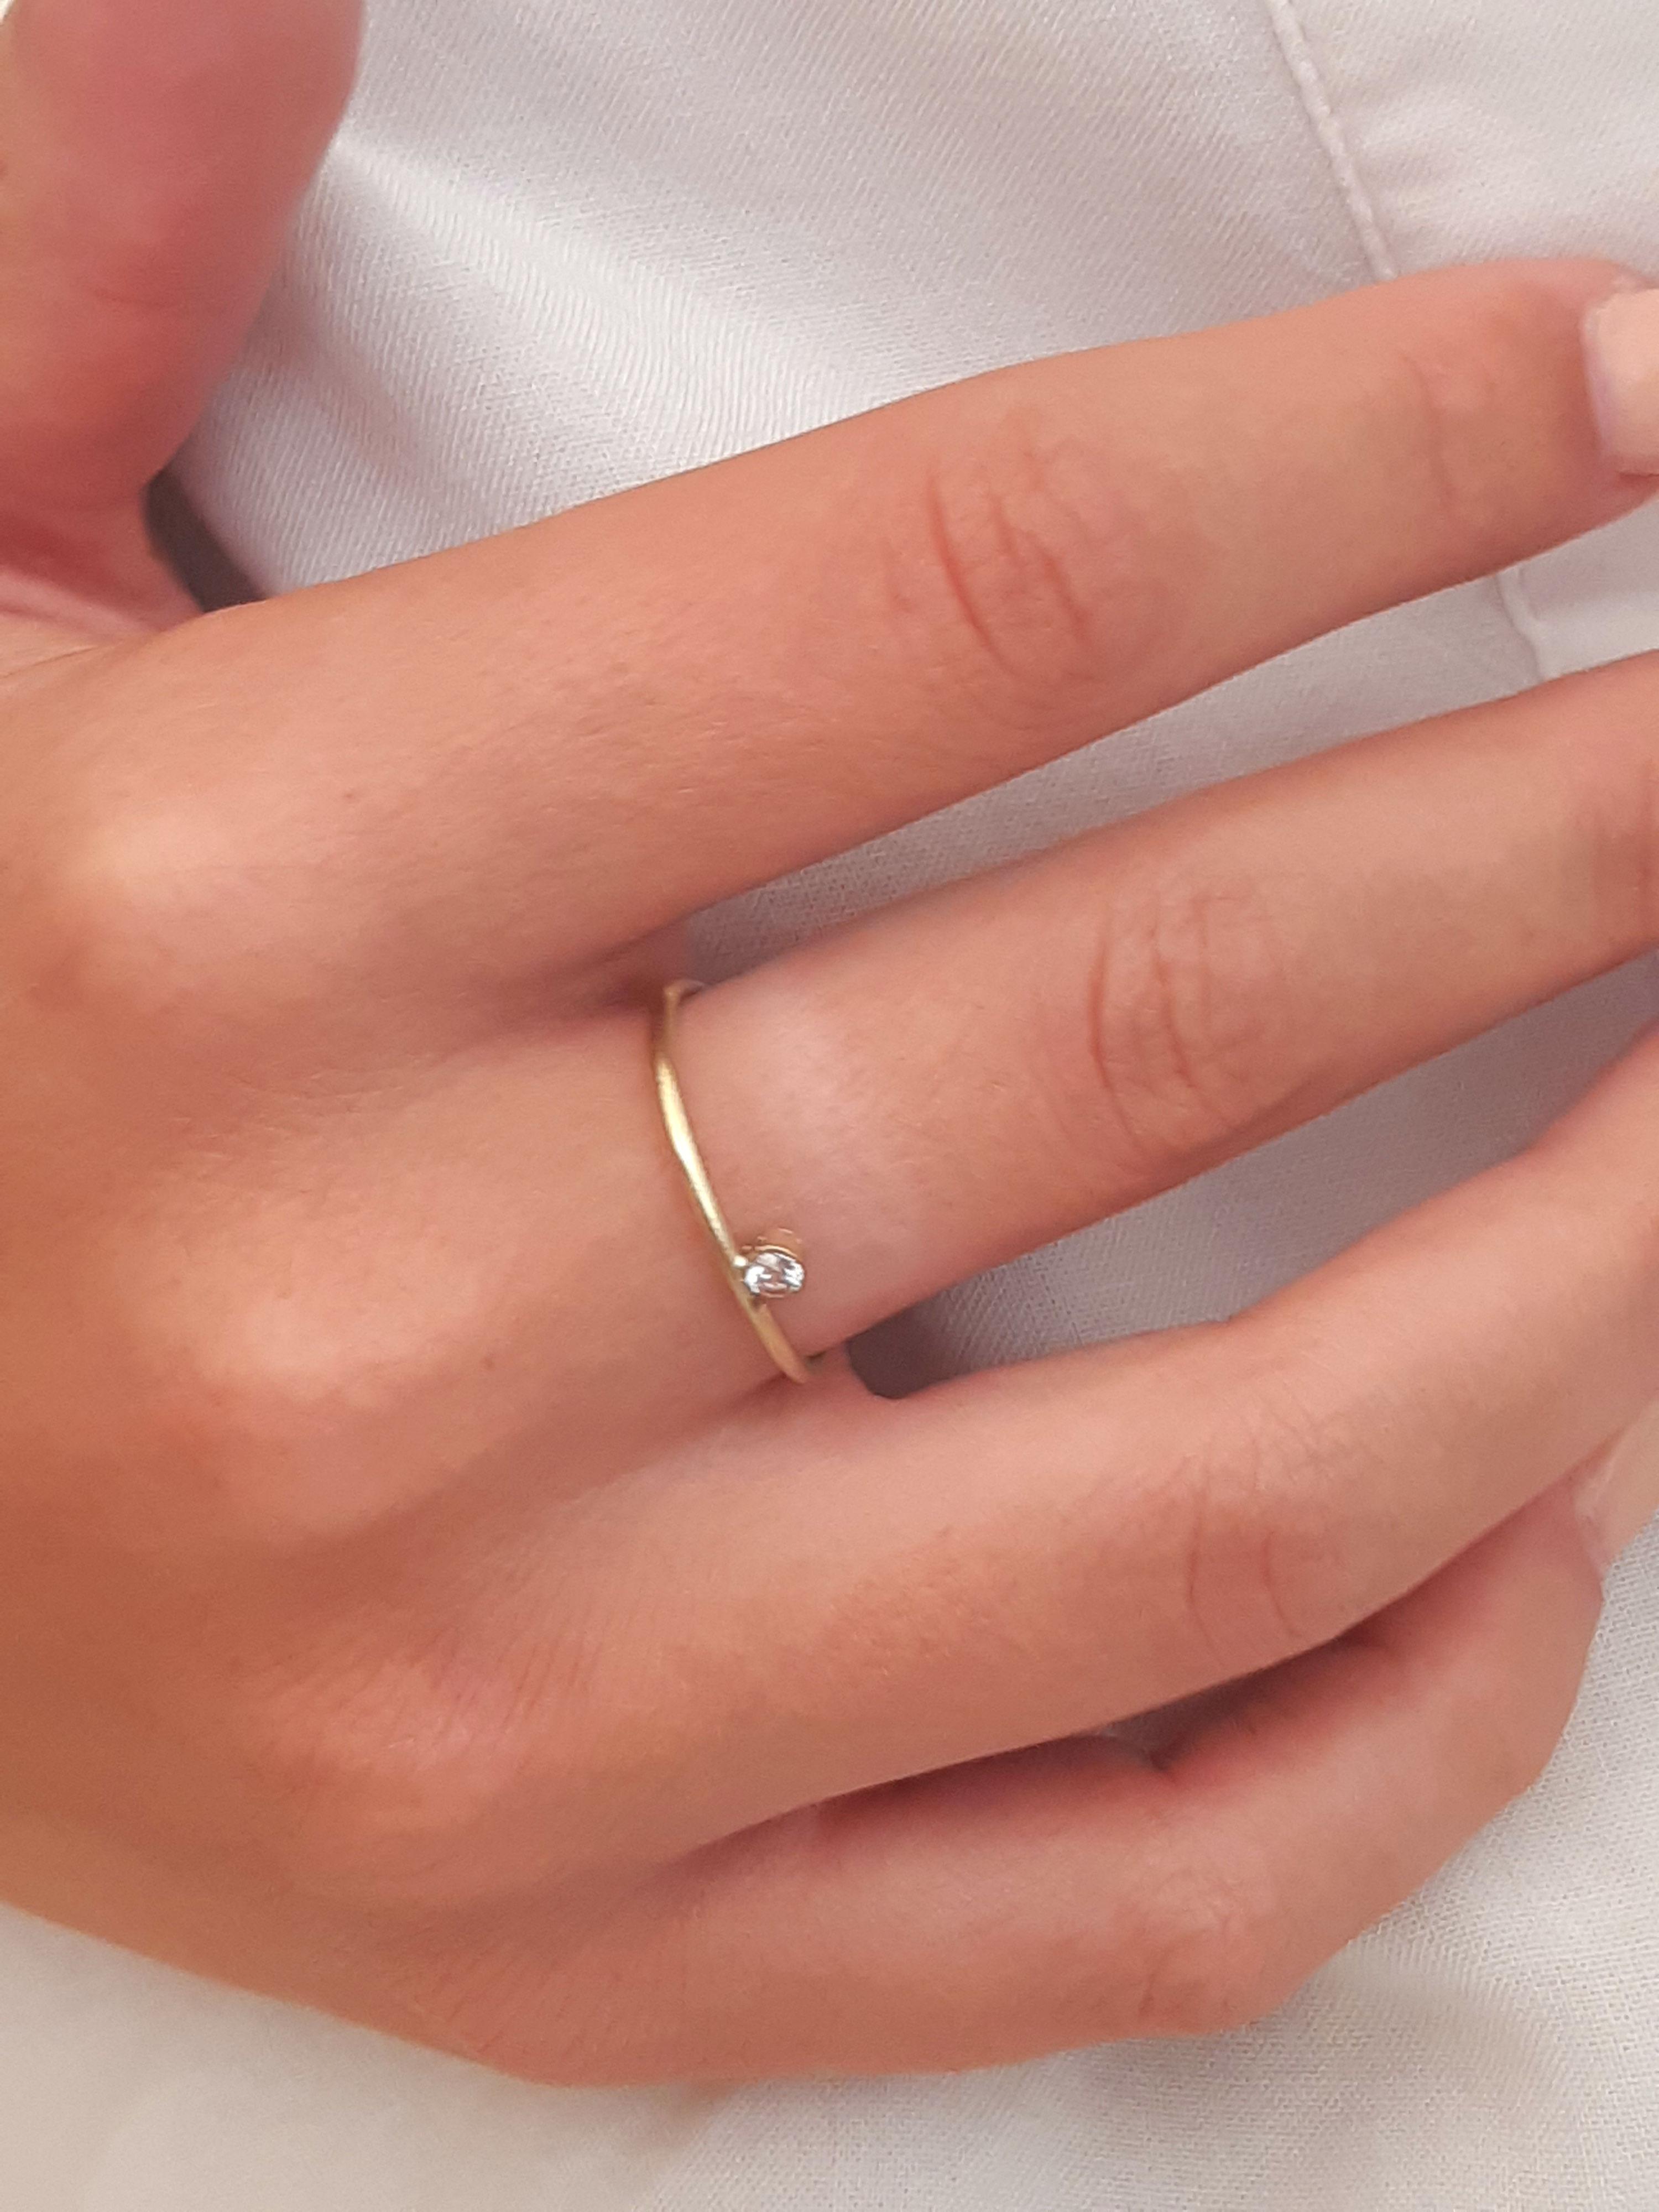 Rigel 1 diamond ring on model